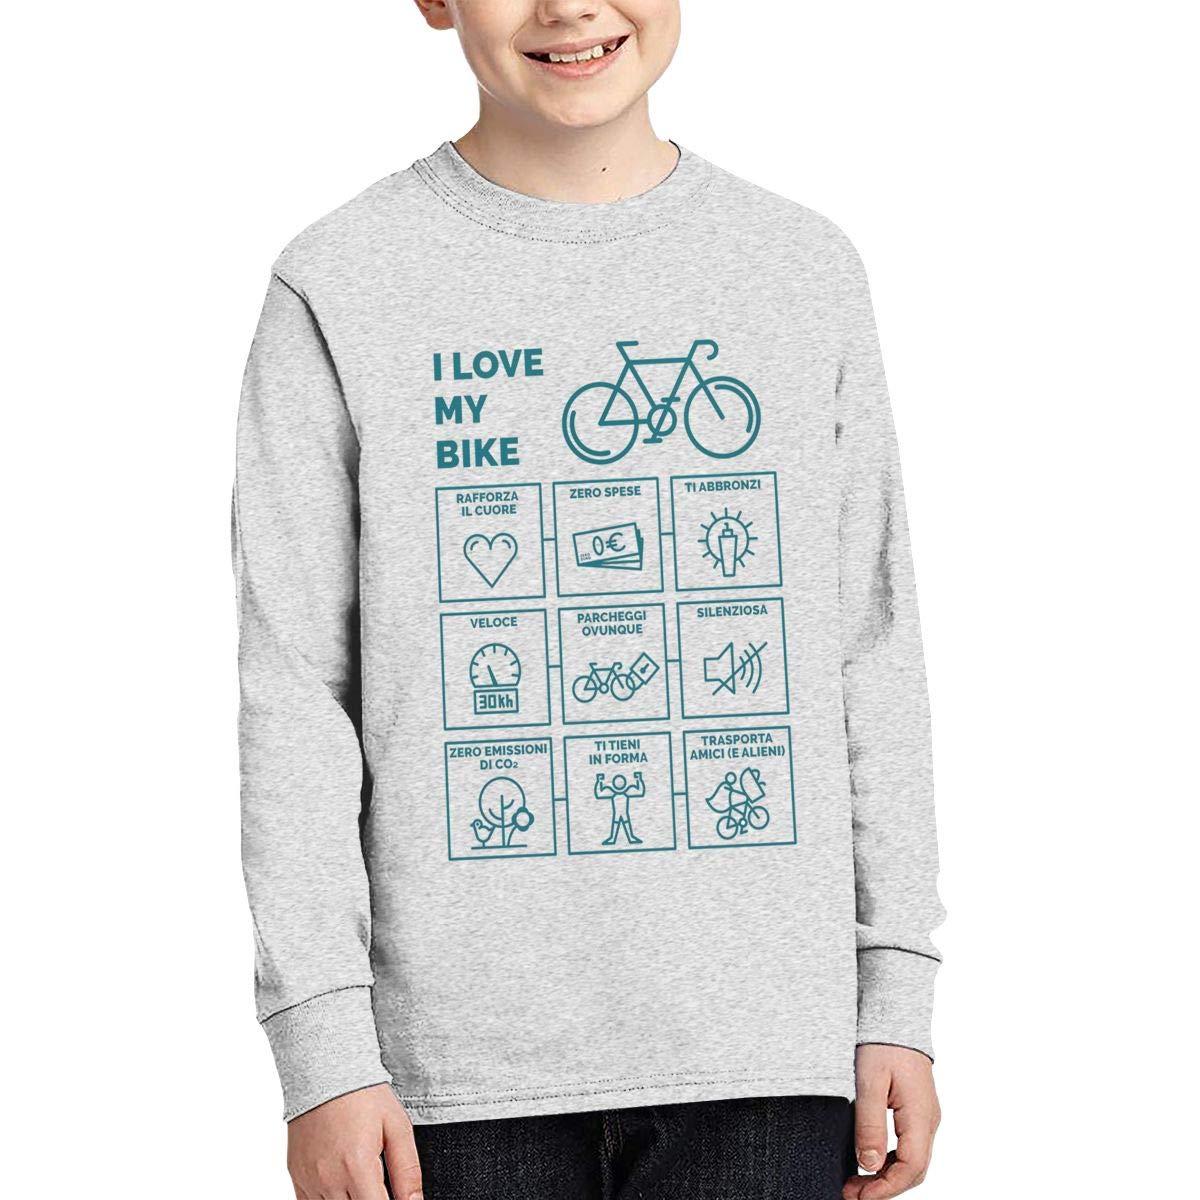 I Love My Bike Boys Long Sleeve T-Shirt,Fashion Youth Tops